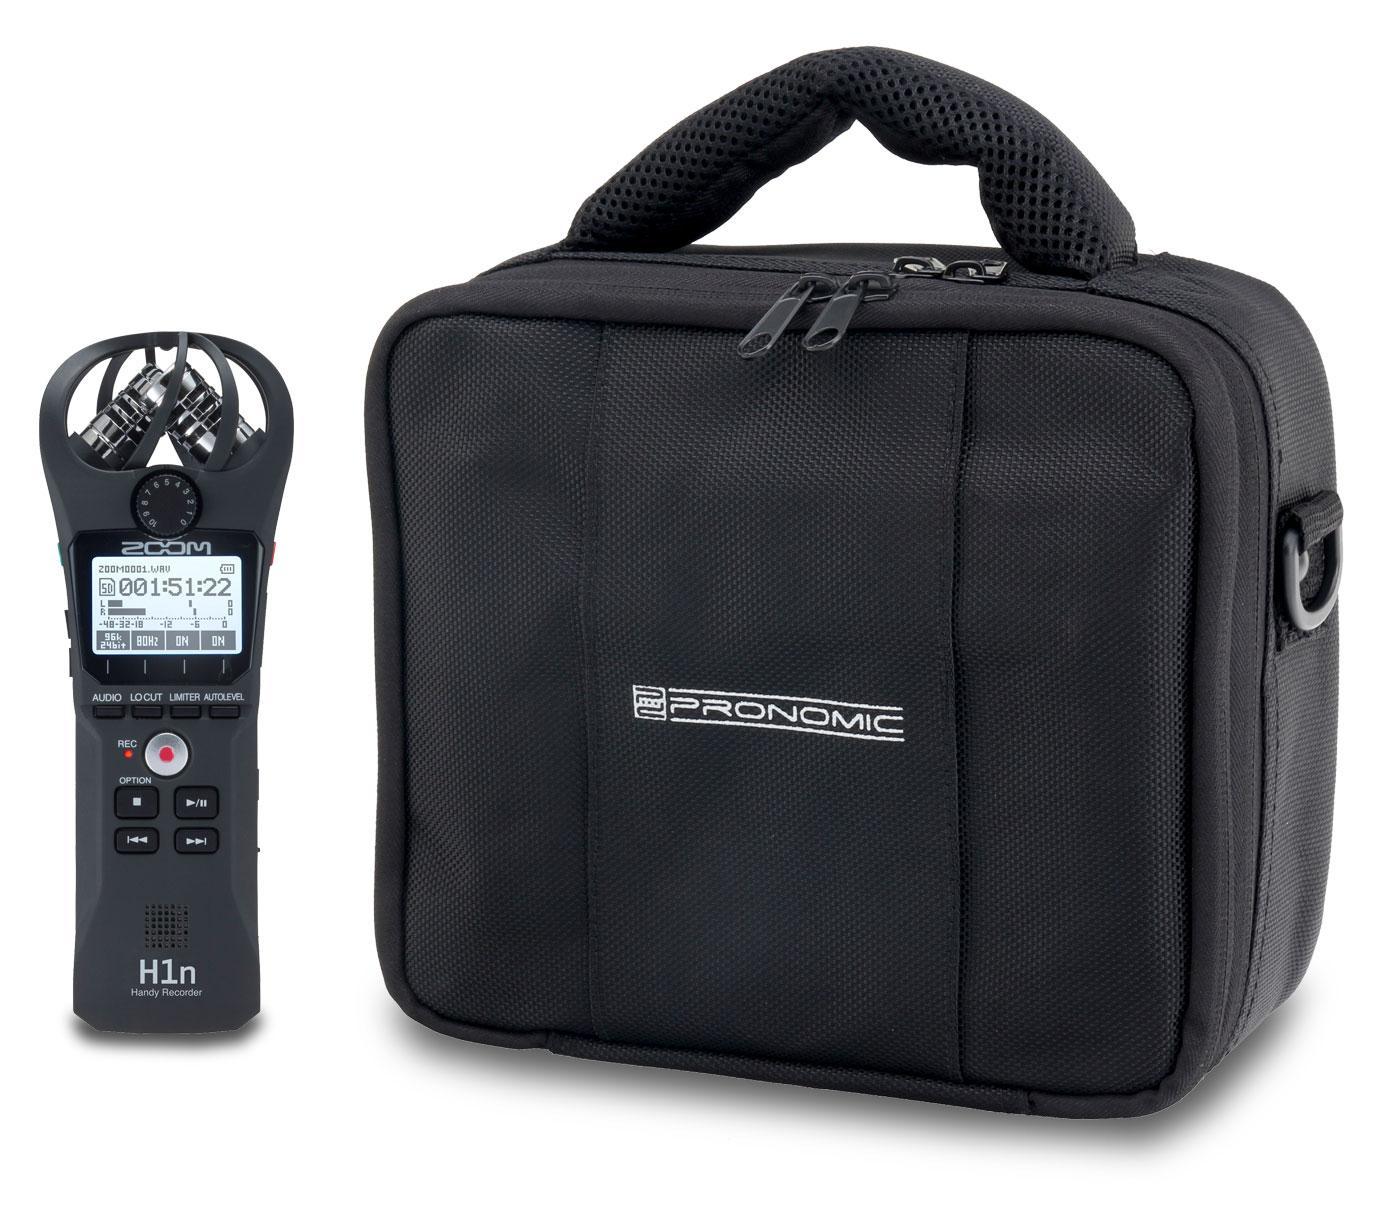 Zoom H1n Handyrecorder Set mit Flex Bag